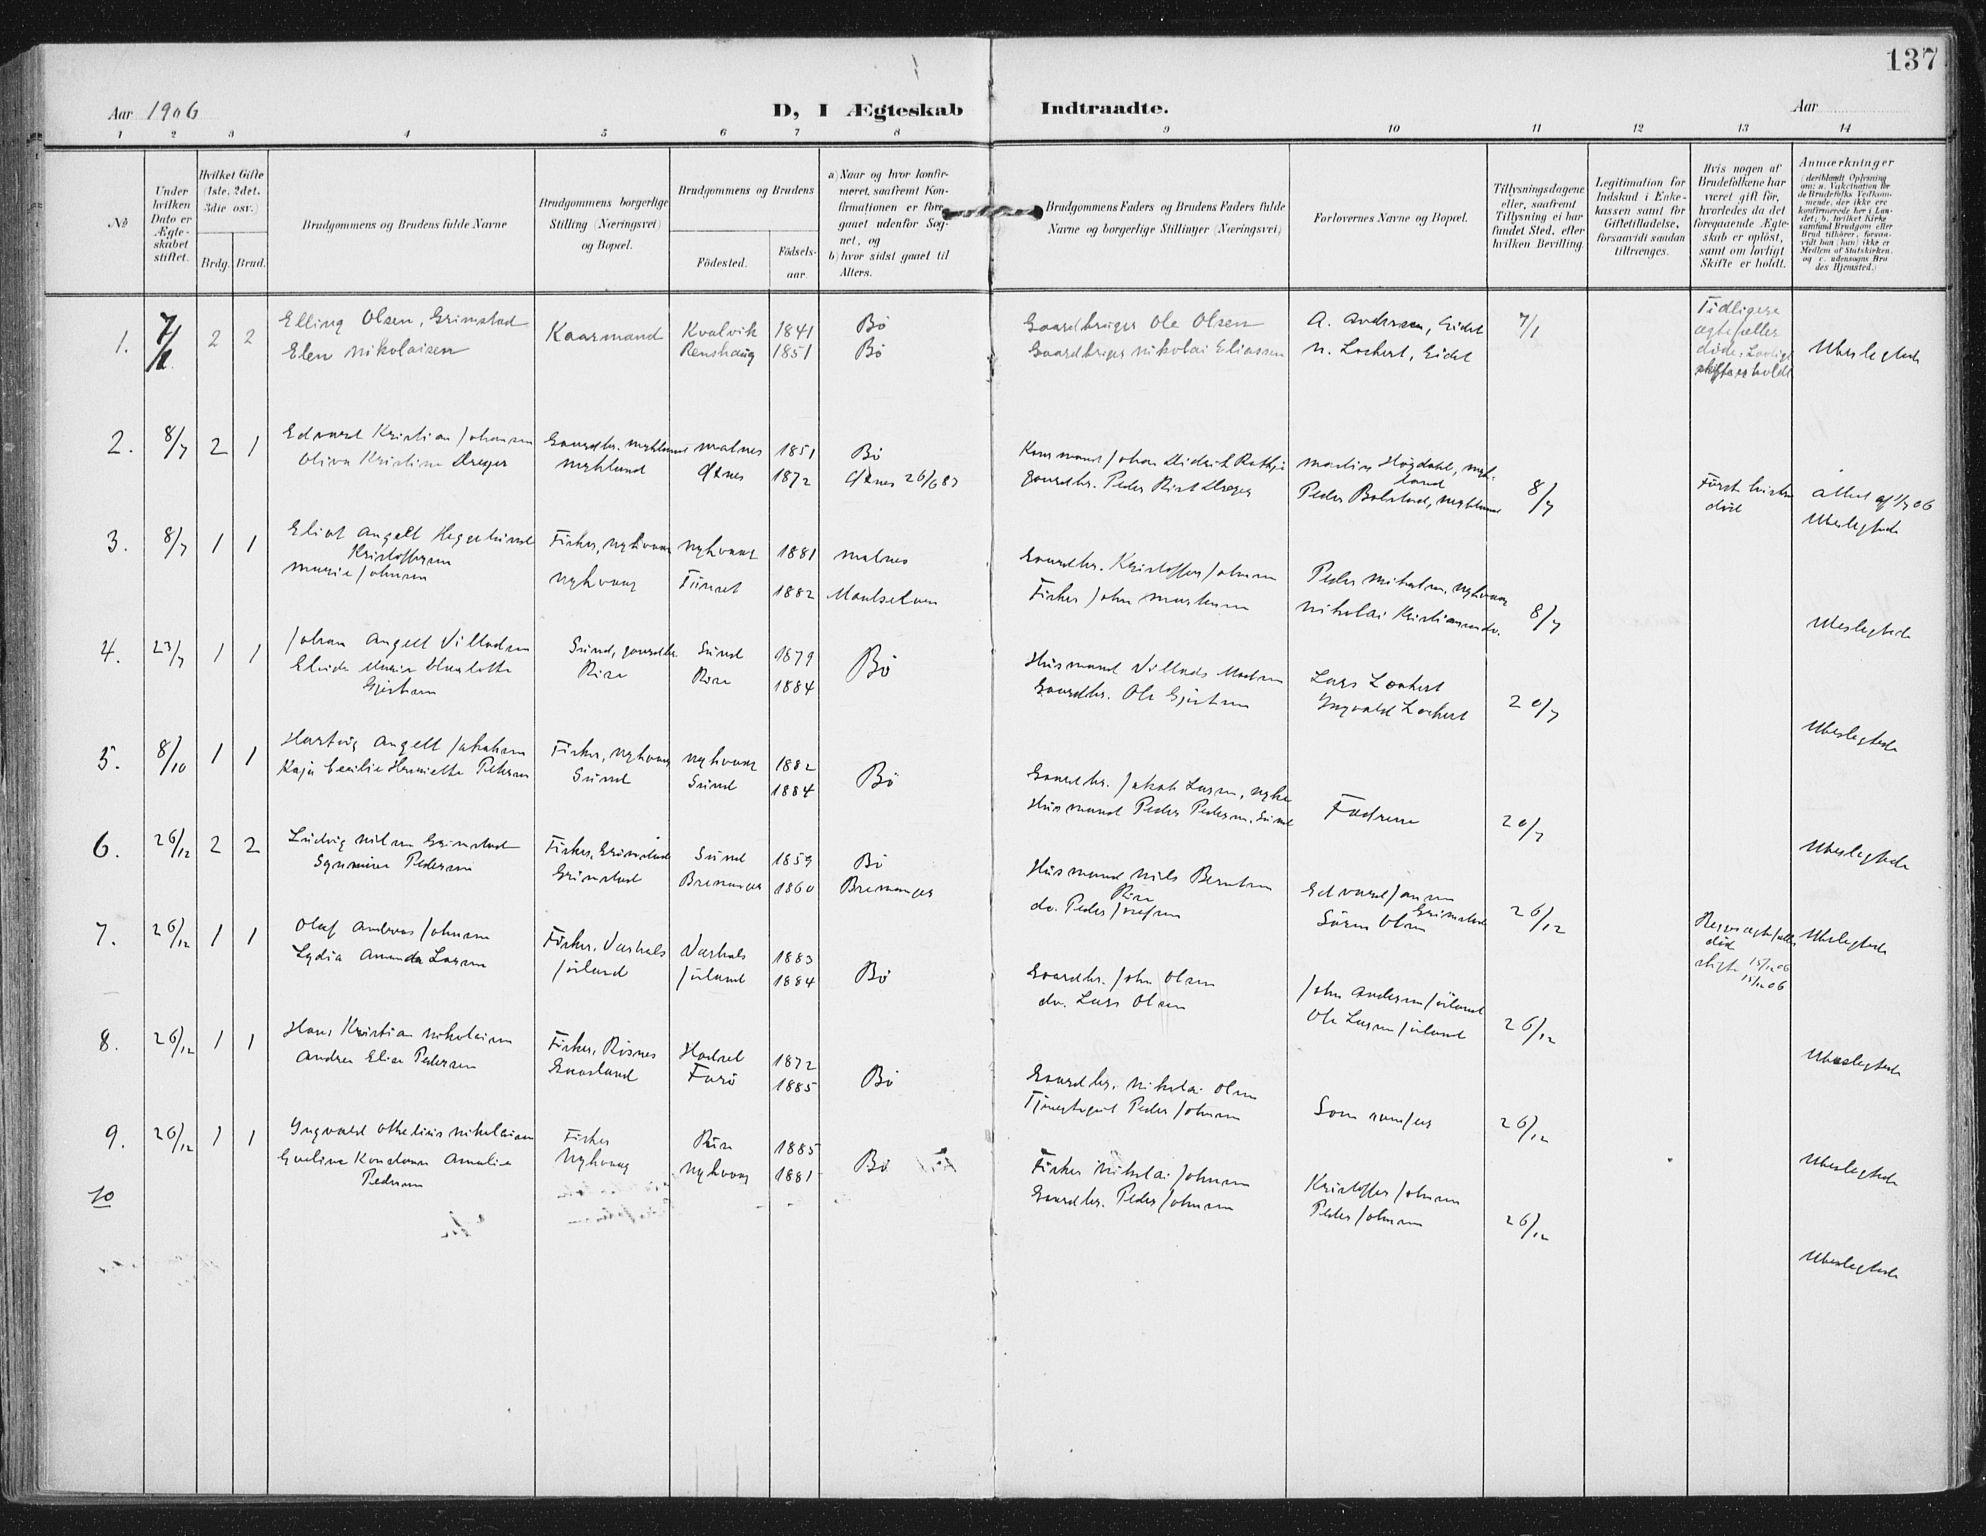 SAT, Ministerialprotokoller, klokkerbøker og fødselsregistre - Nordland, 892/L1321: Ministerialbok nr. 892A02, 1902-1918, s. 137